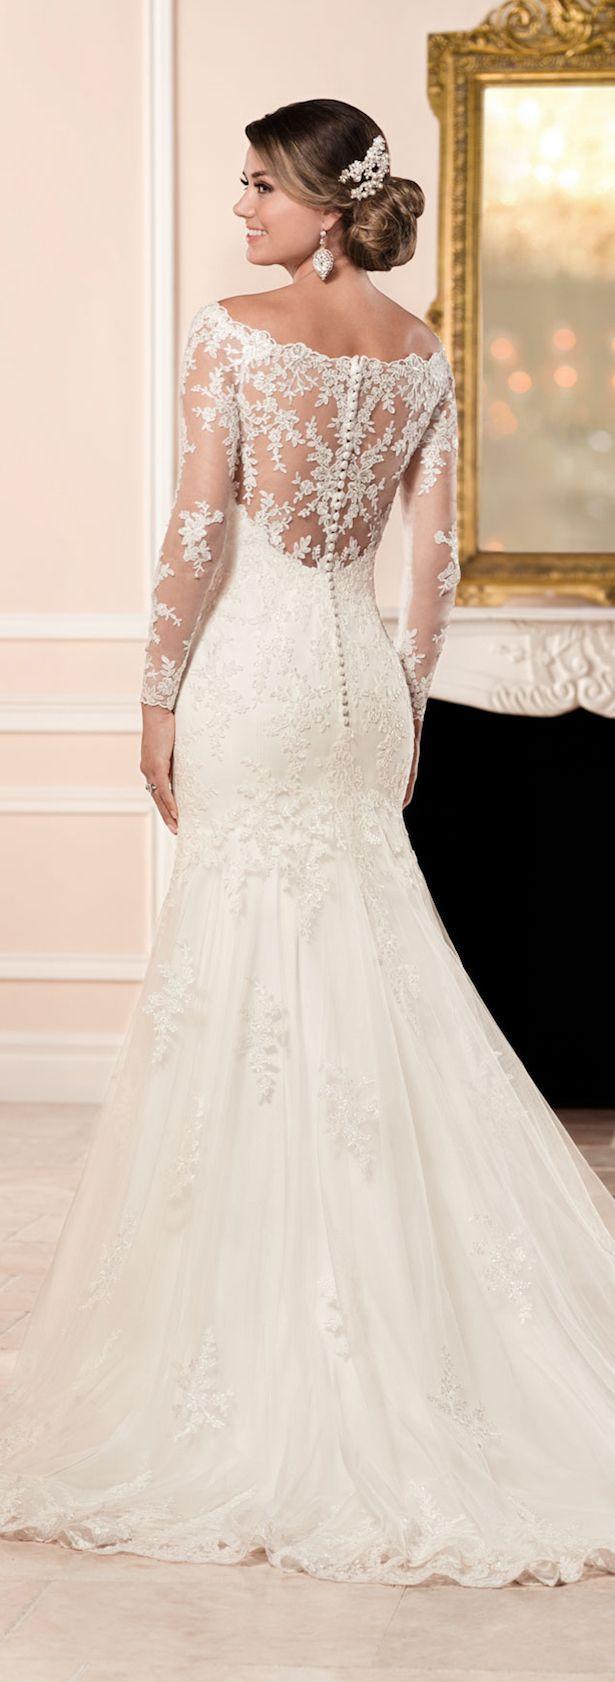 belle wedding dresses dress for a wedding Stella York Fall Bridal Collection Long Sleeved Wedding DressesLong